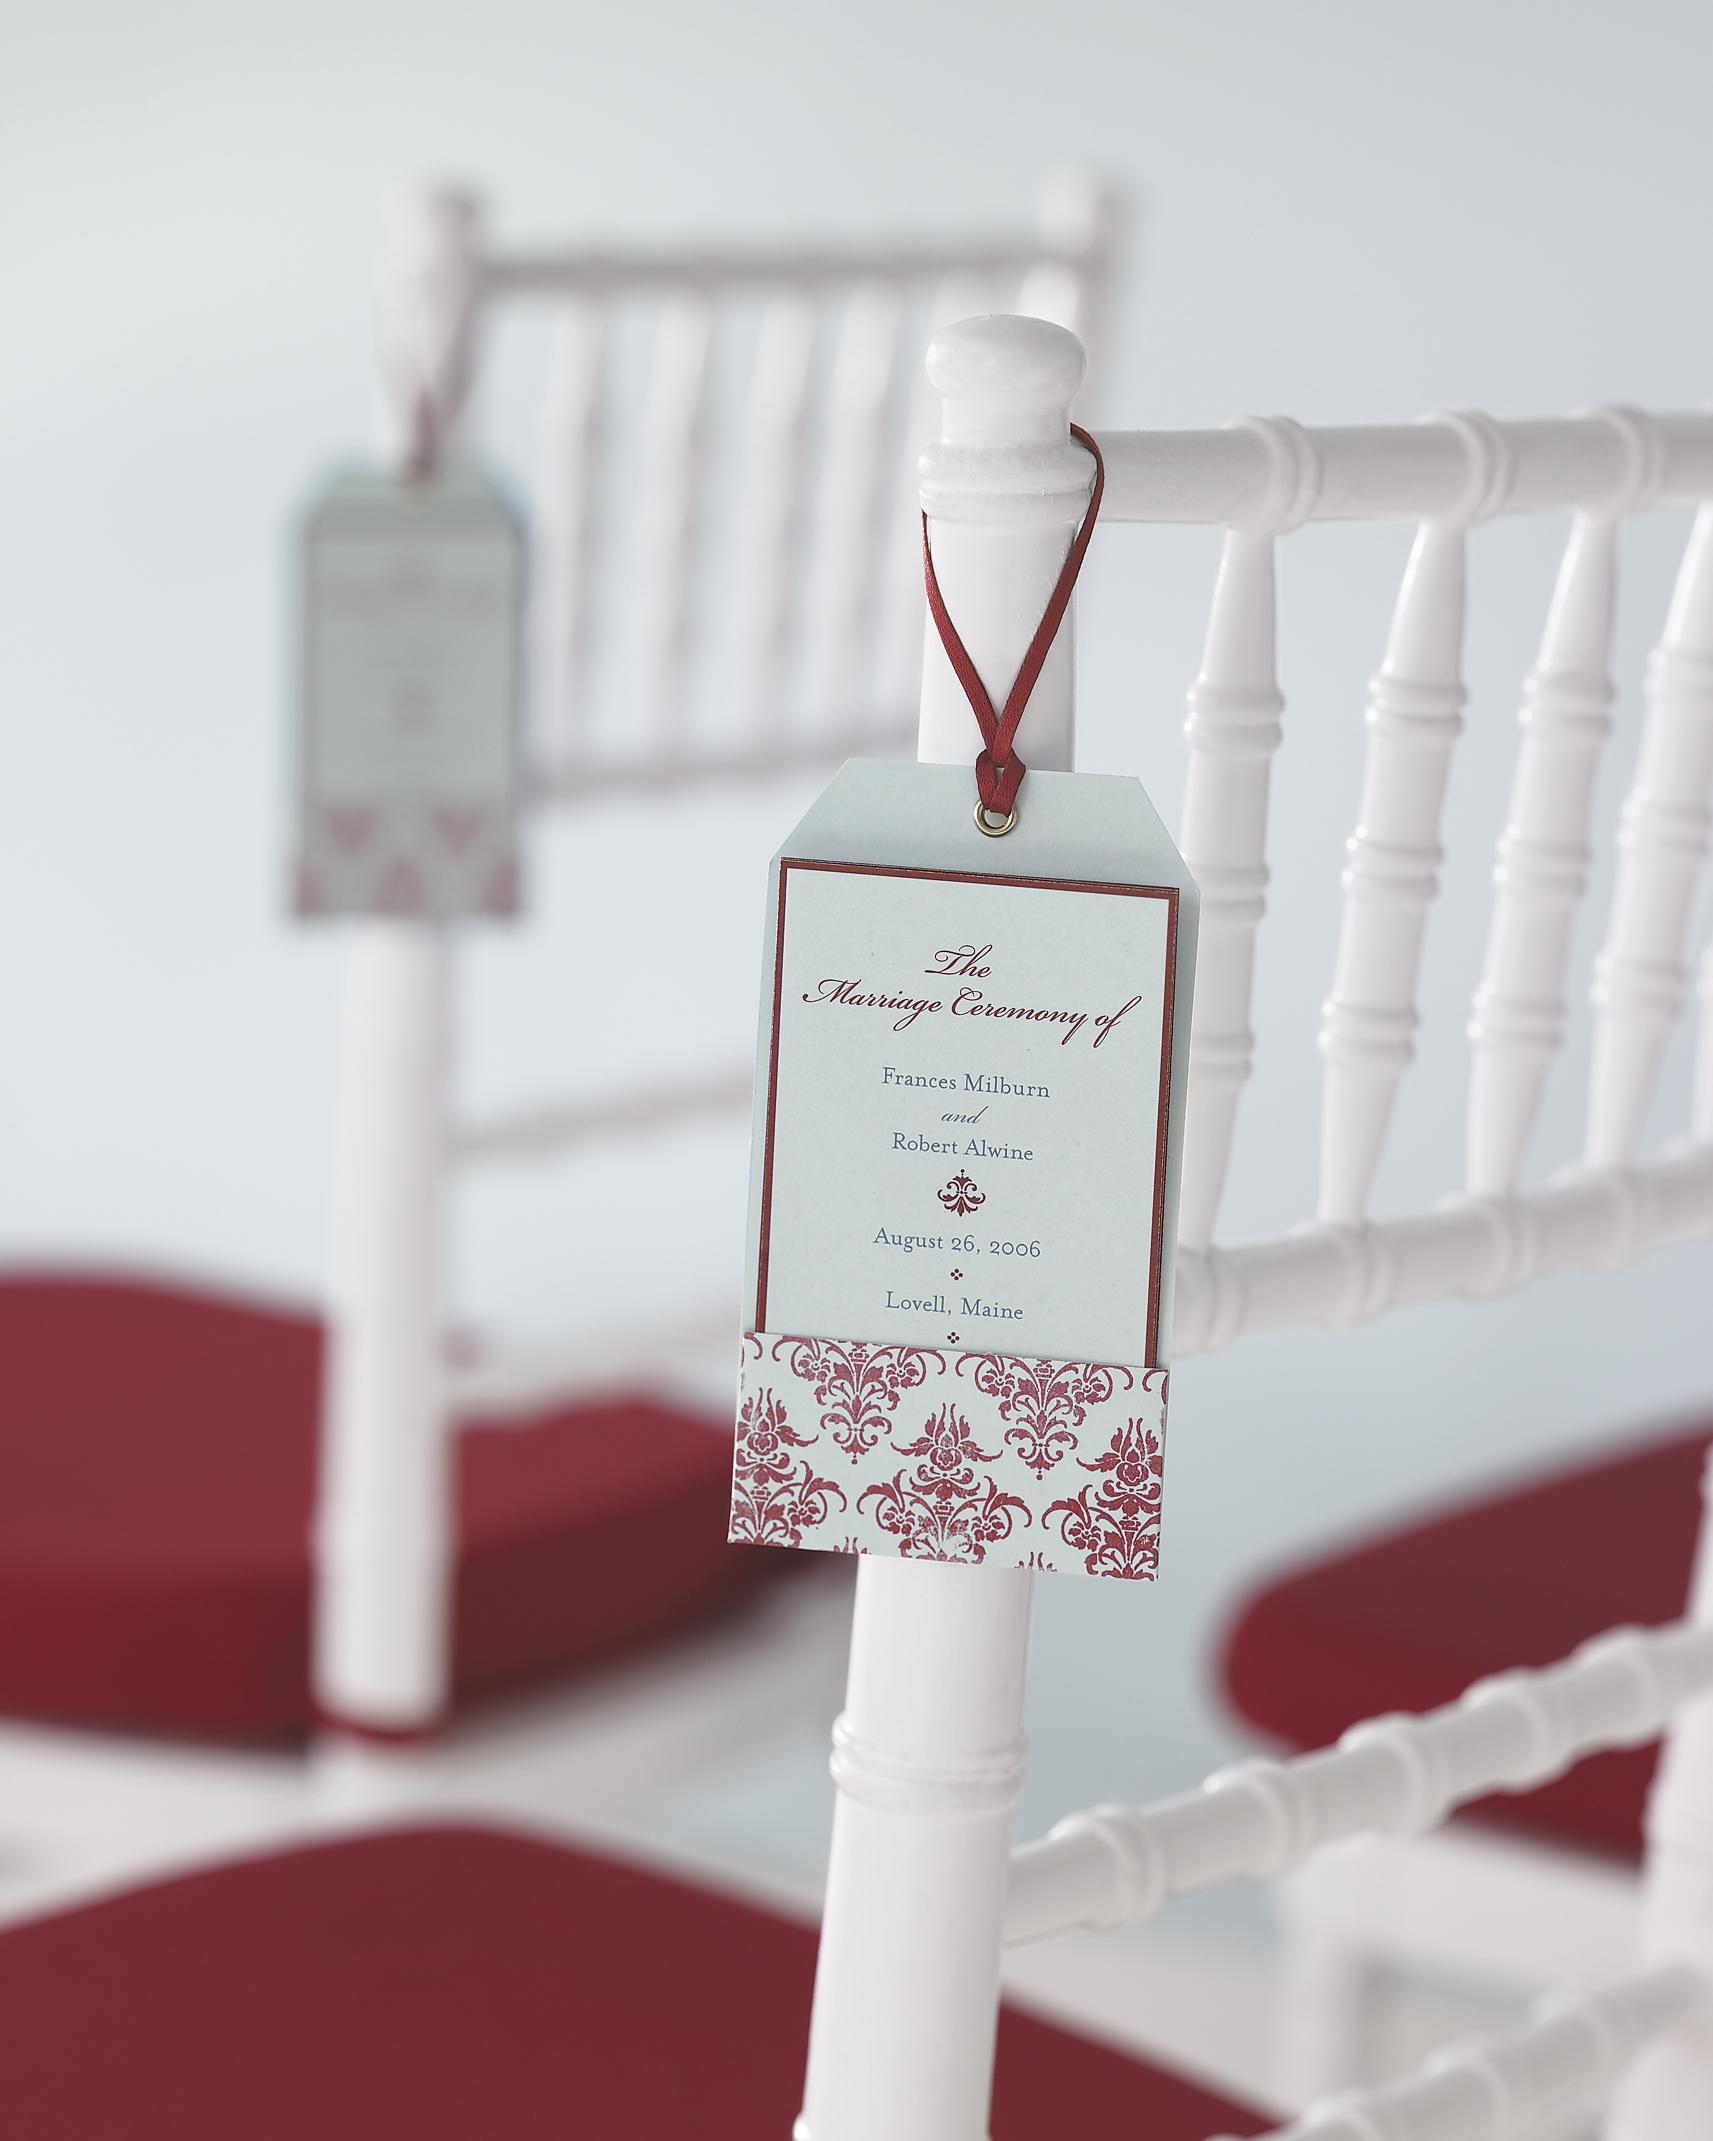 diy-wedding-ceremony-programs-mwd102100program_038-0515.jpg